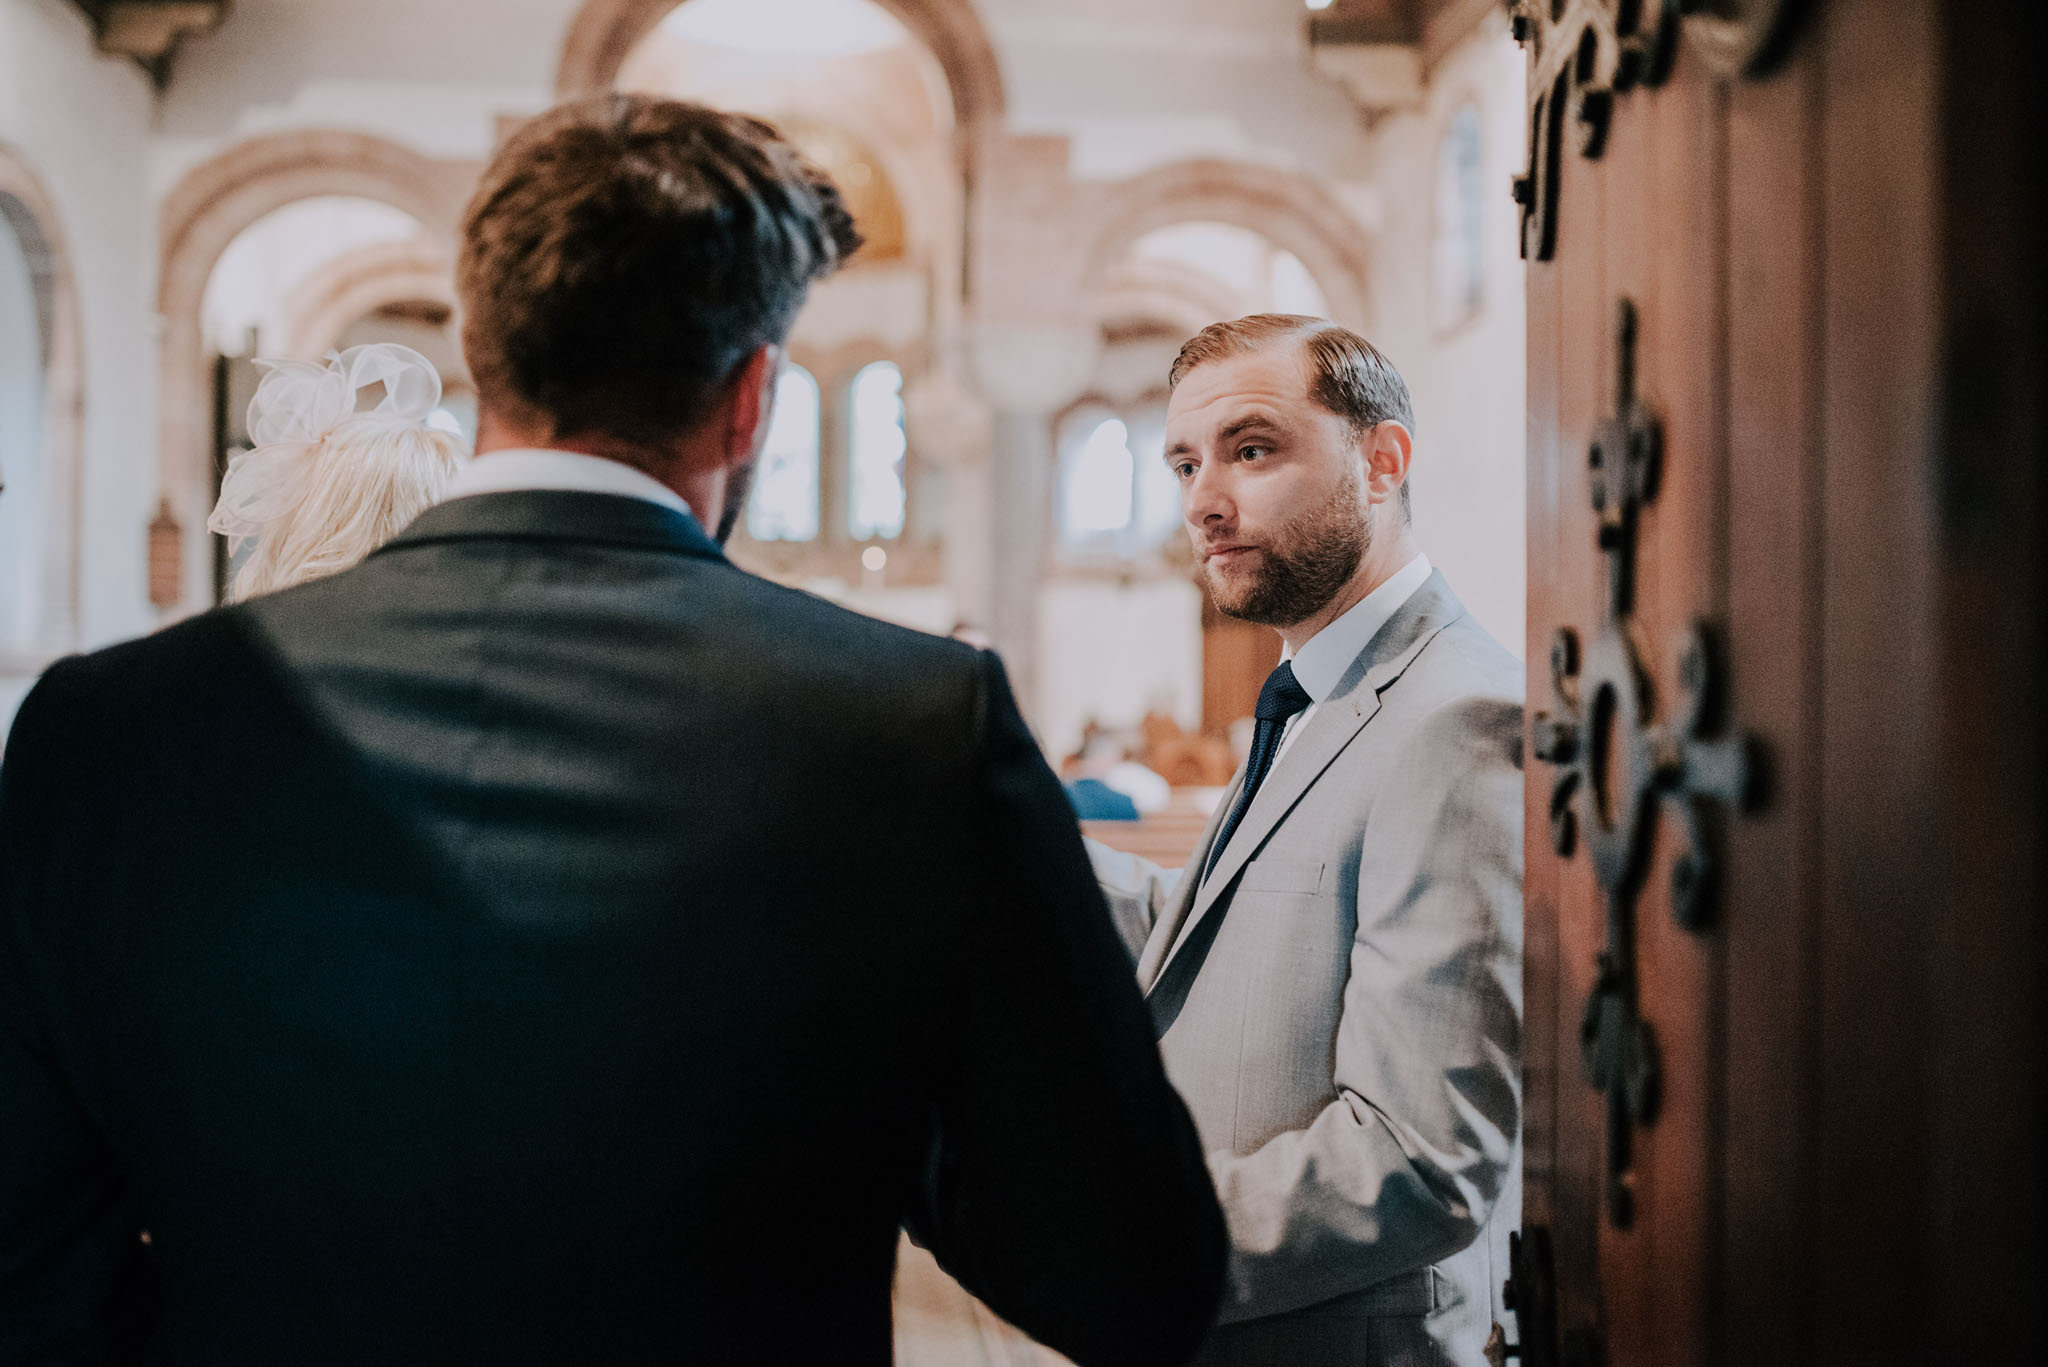 wedding-photographer-glewstone-court-hereford-scott-stockwell-photography103.jpg